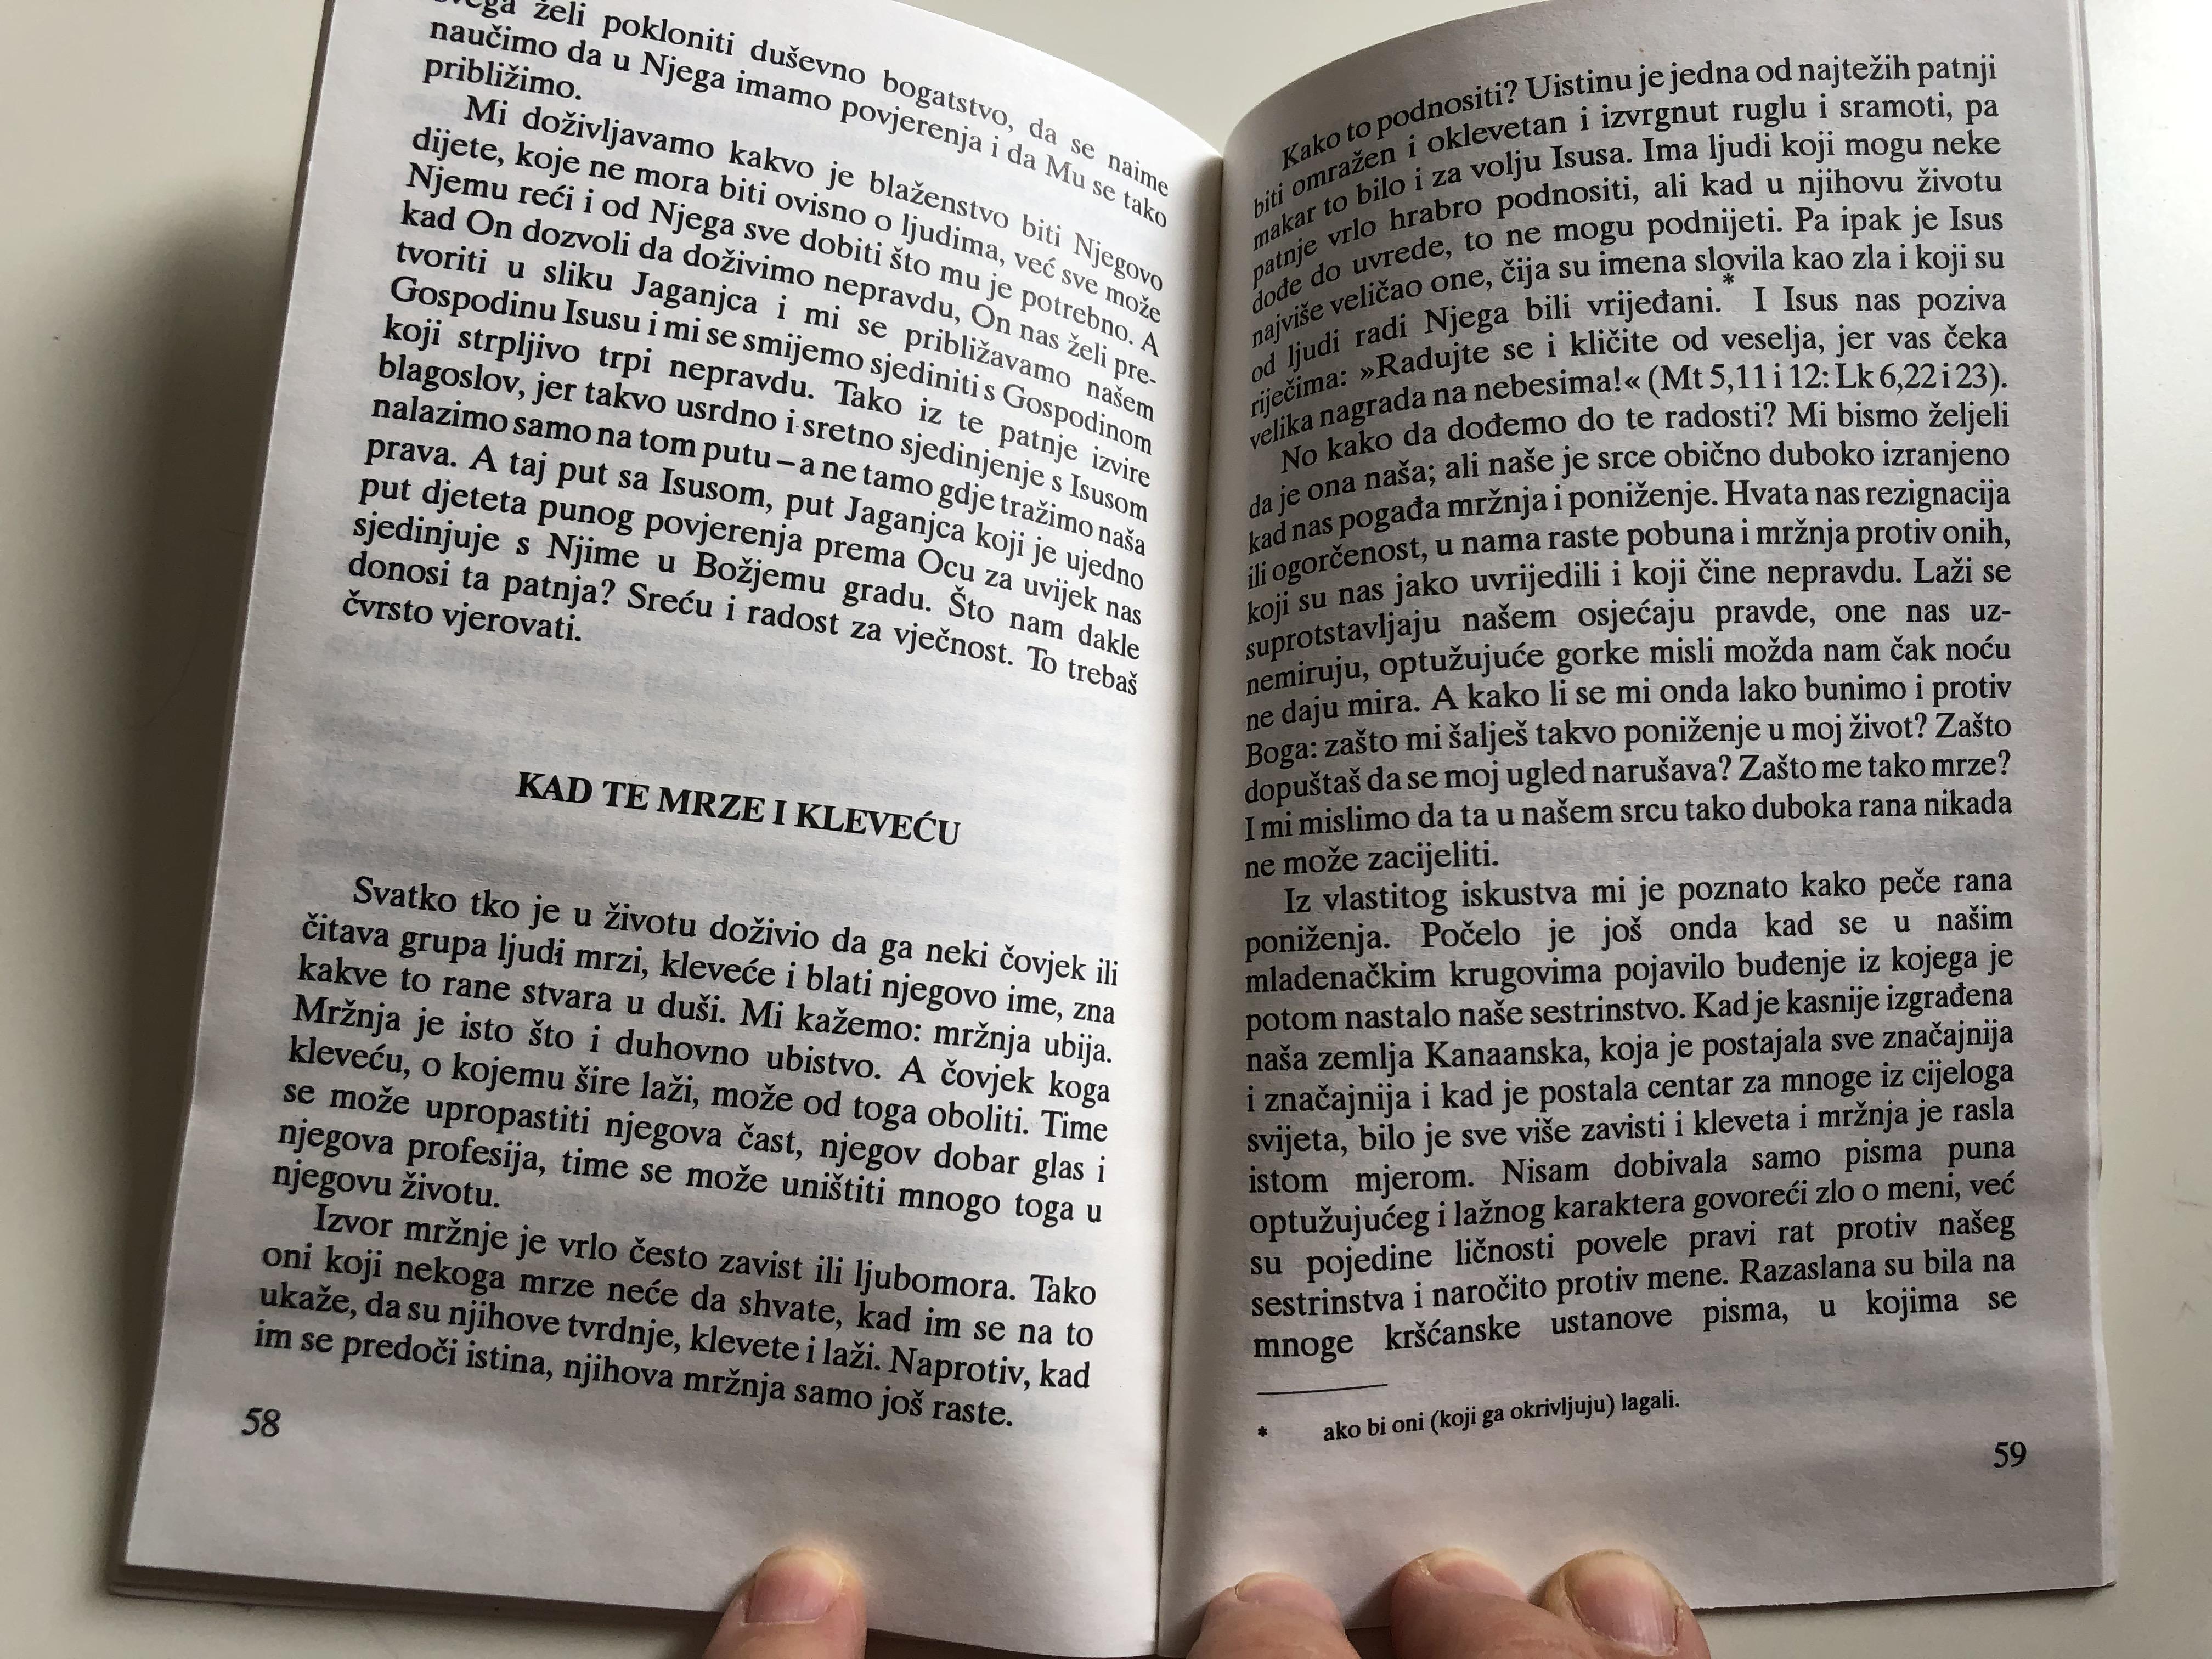 patnja-mi-postade-dobitkom-by-m.-basilea-schlink-croatian-translation-of-zum-cewinn-ward-mir-das-leid-5.jpg